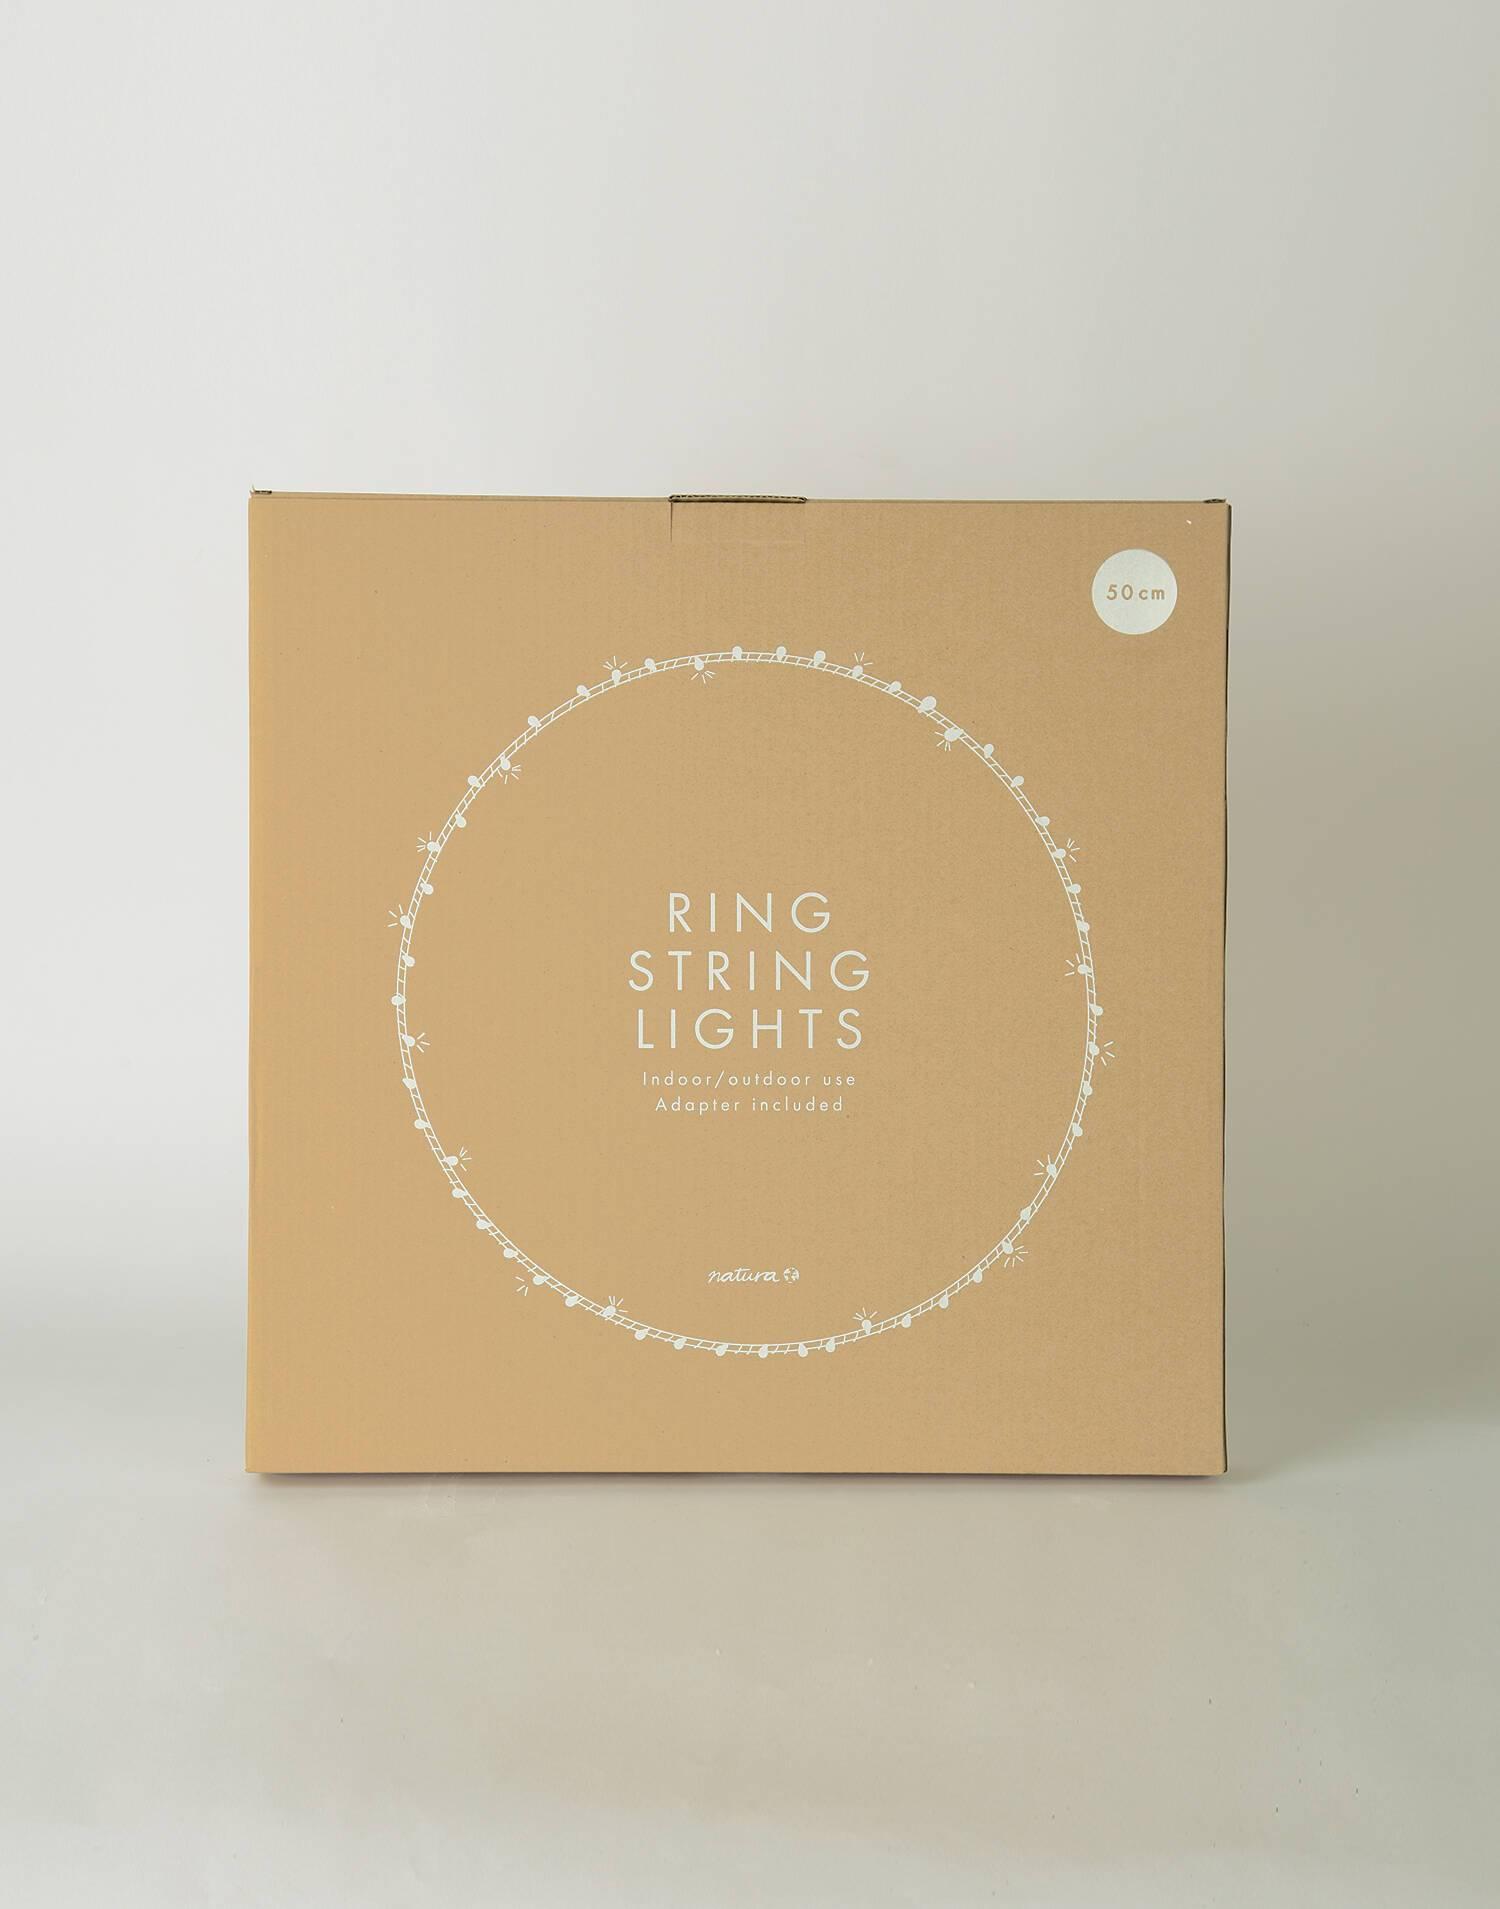 Big ring string lights